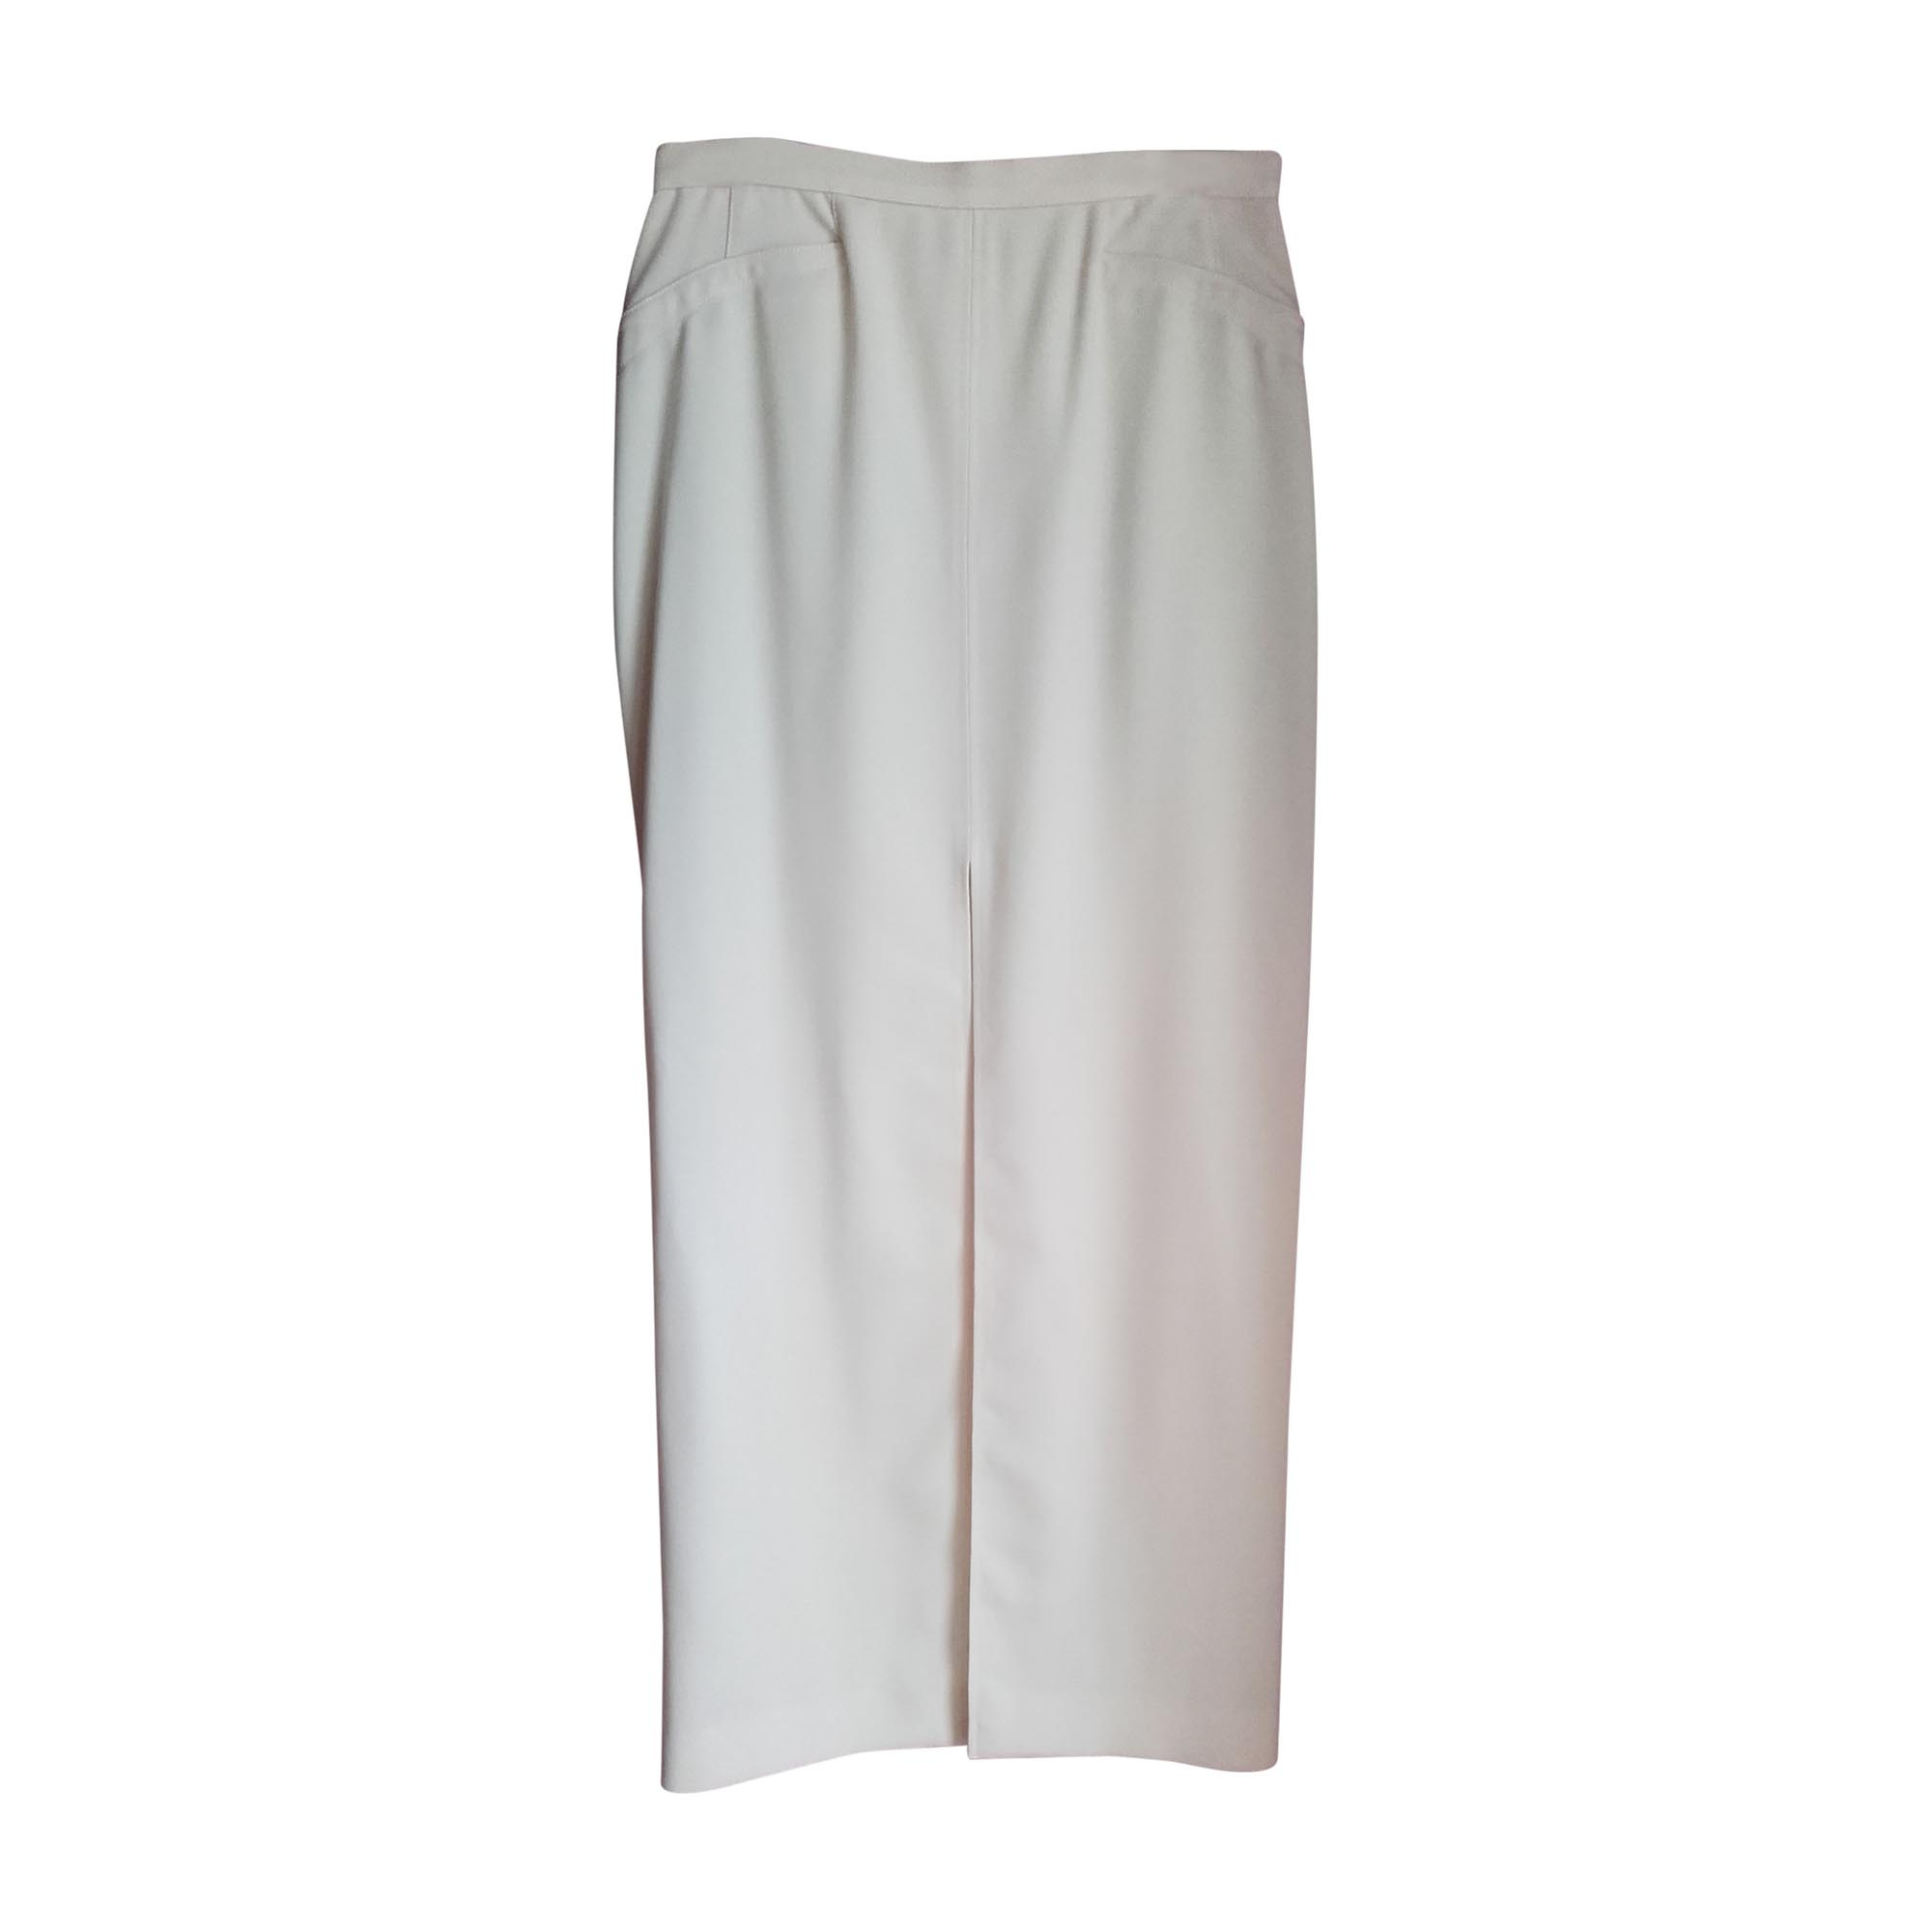 Tailleur jupe THIERRY MUGLER Blanc, blanc cassé, écru